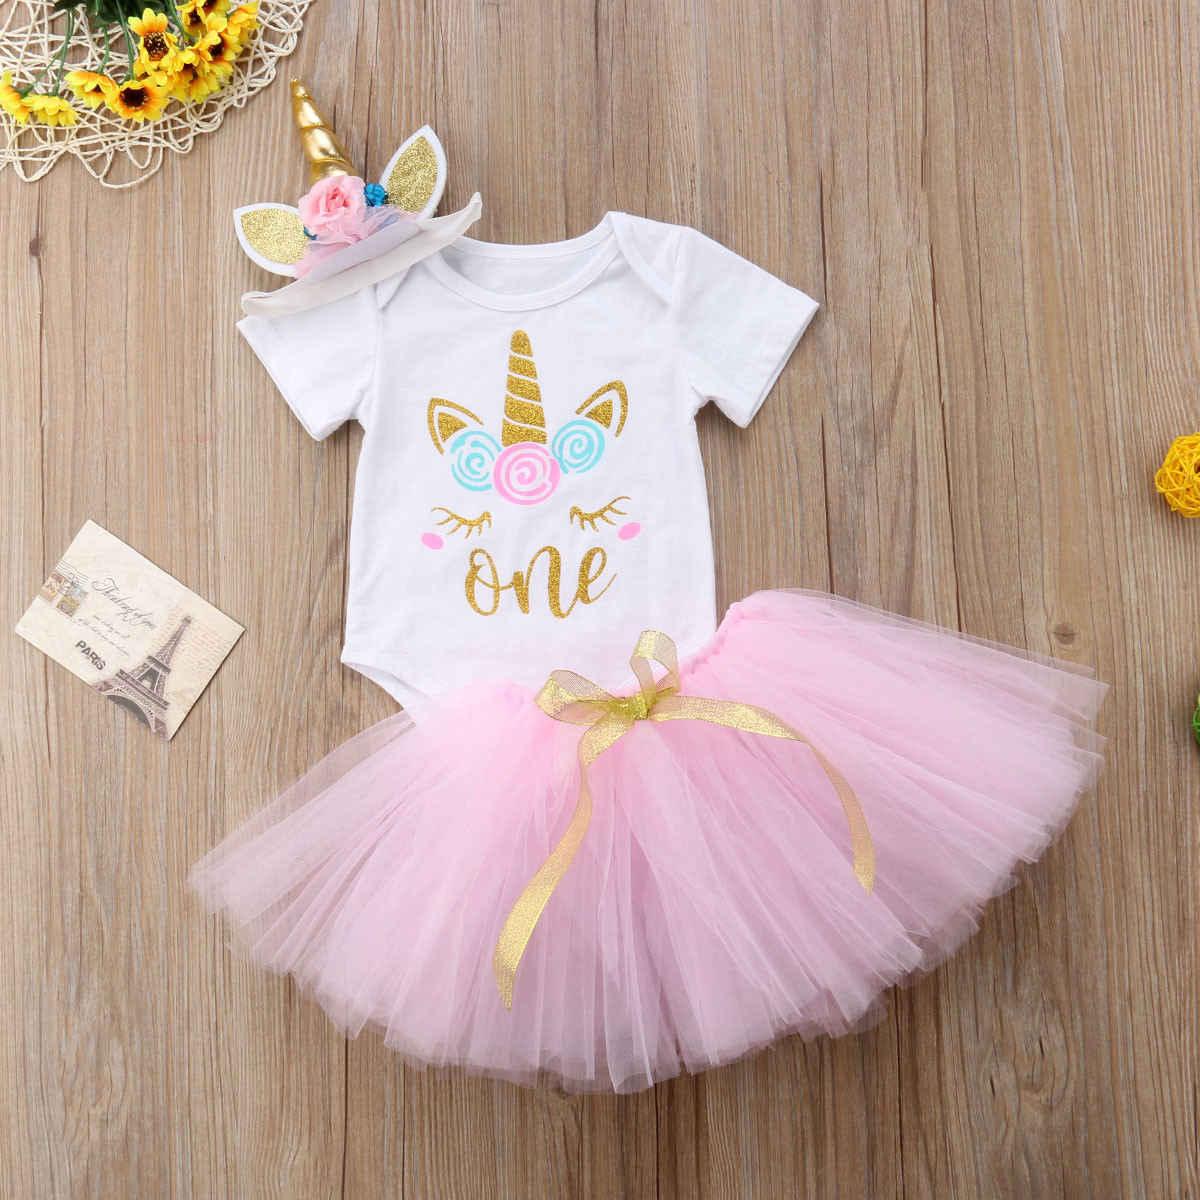 009ec9277 Detail Feedback Questions about Newborn Kid Baby Girls Unicorn Short ...